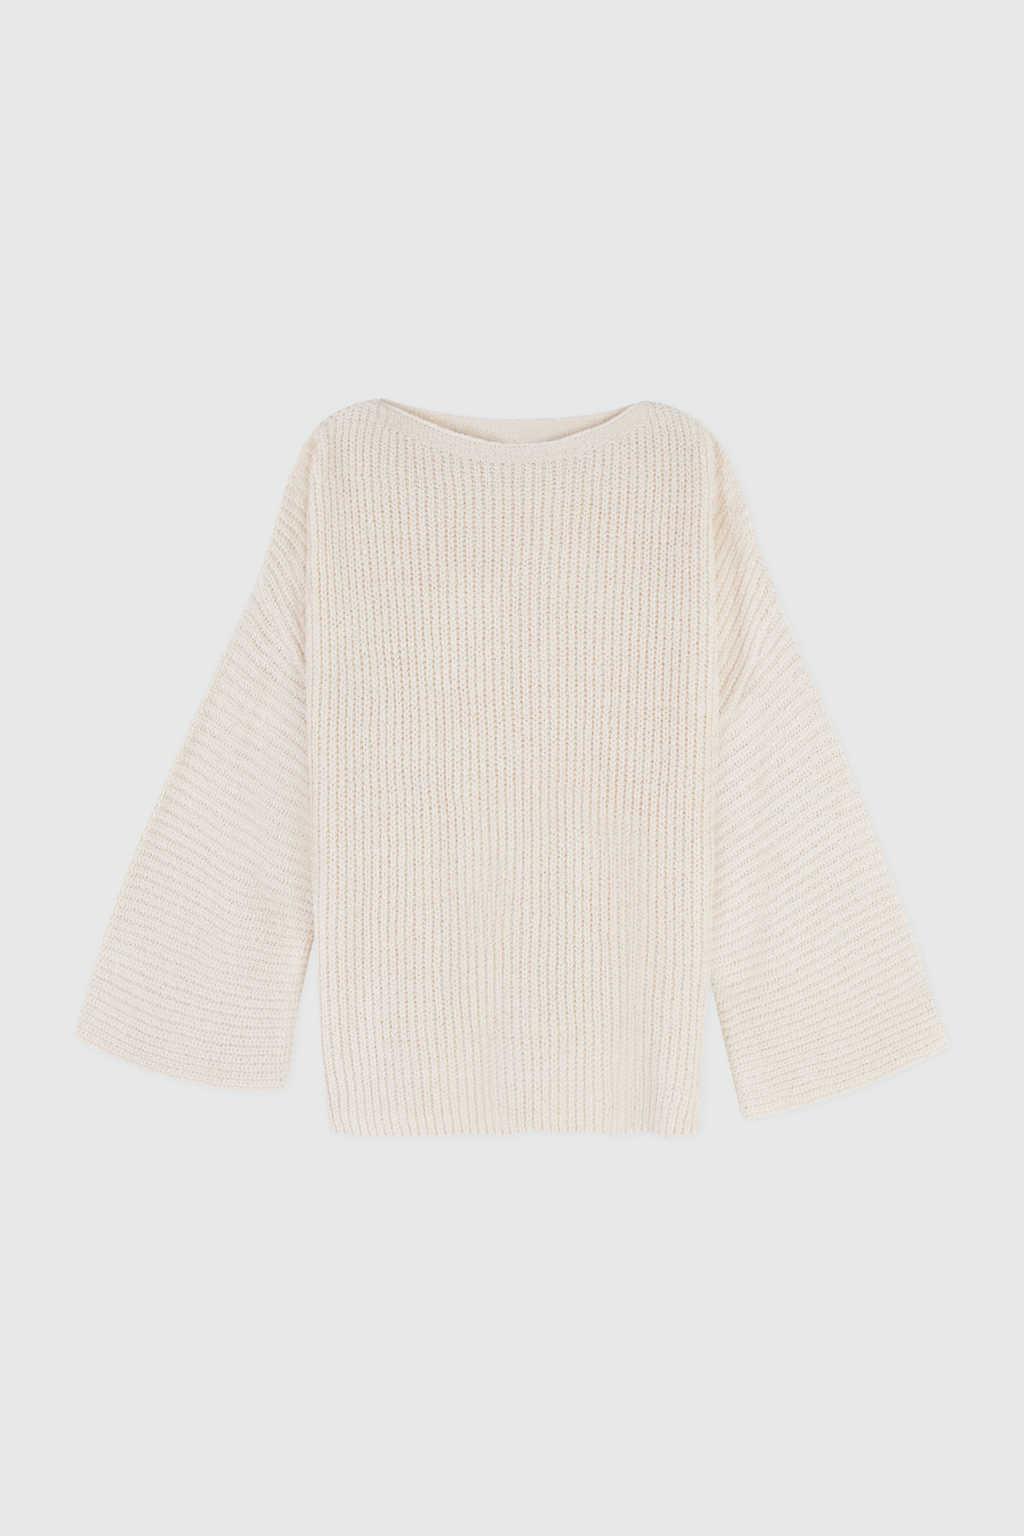 Sweater 2318 Cream 6